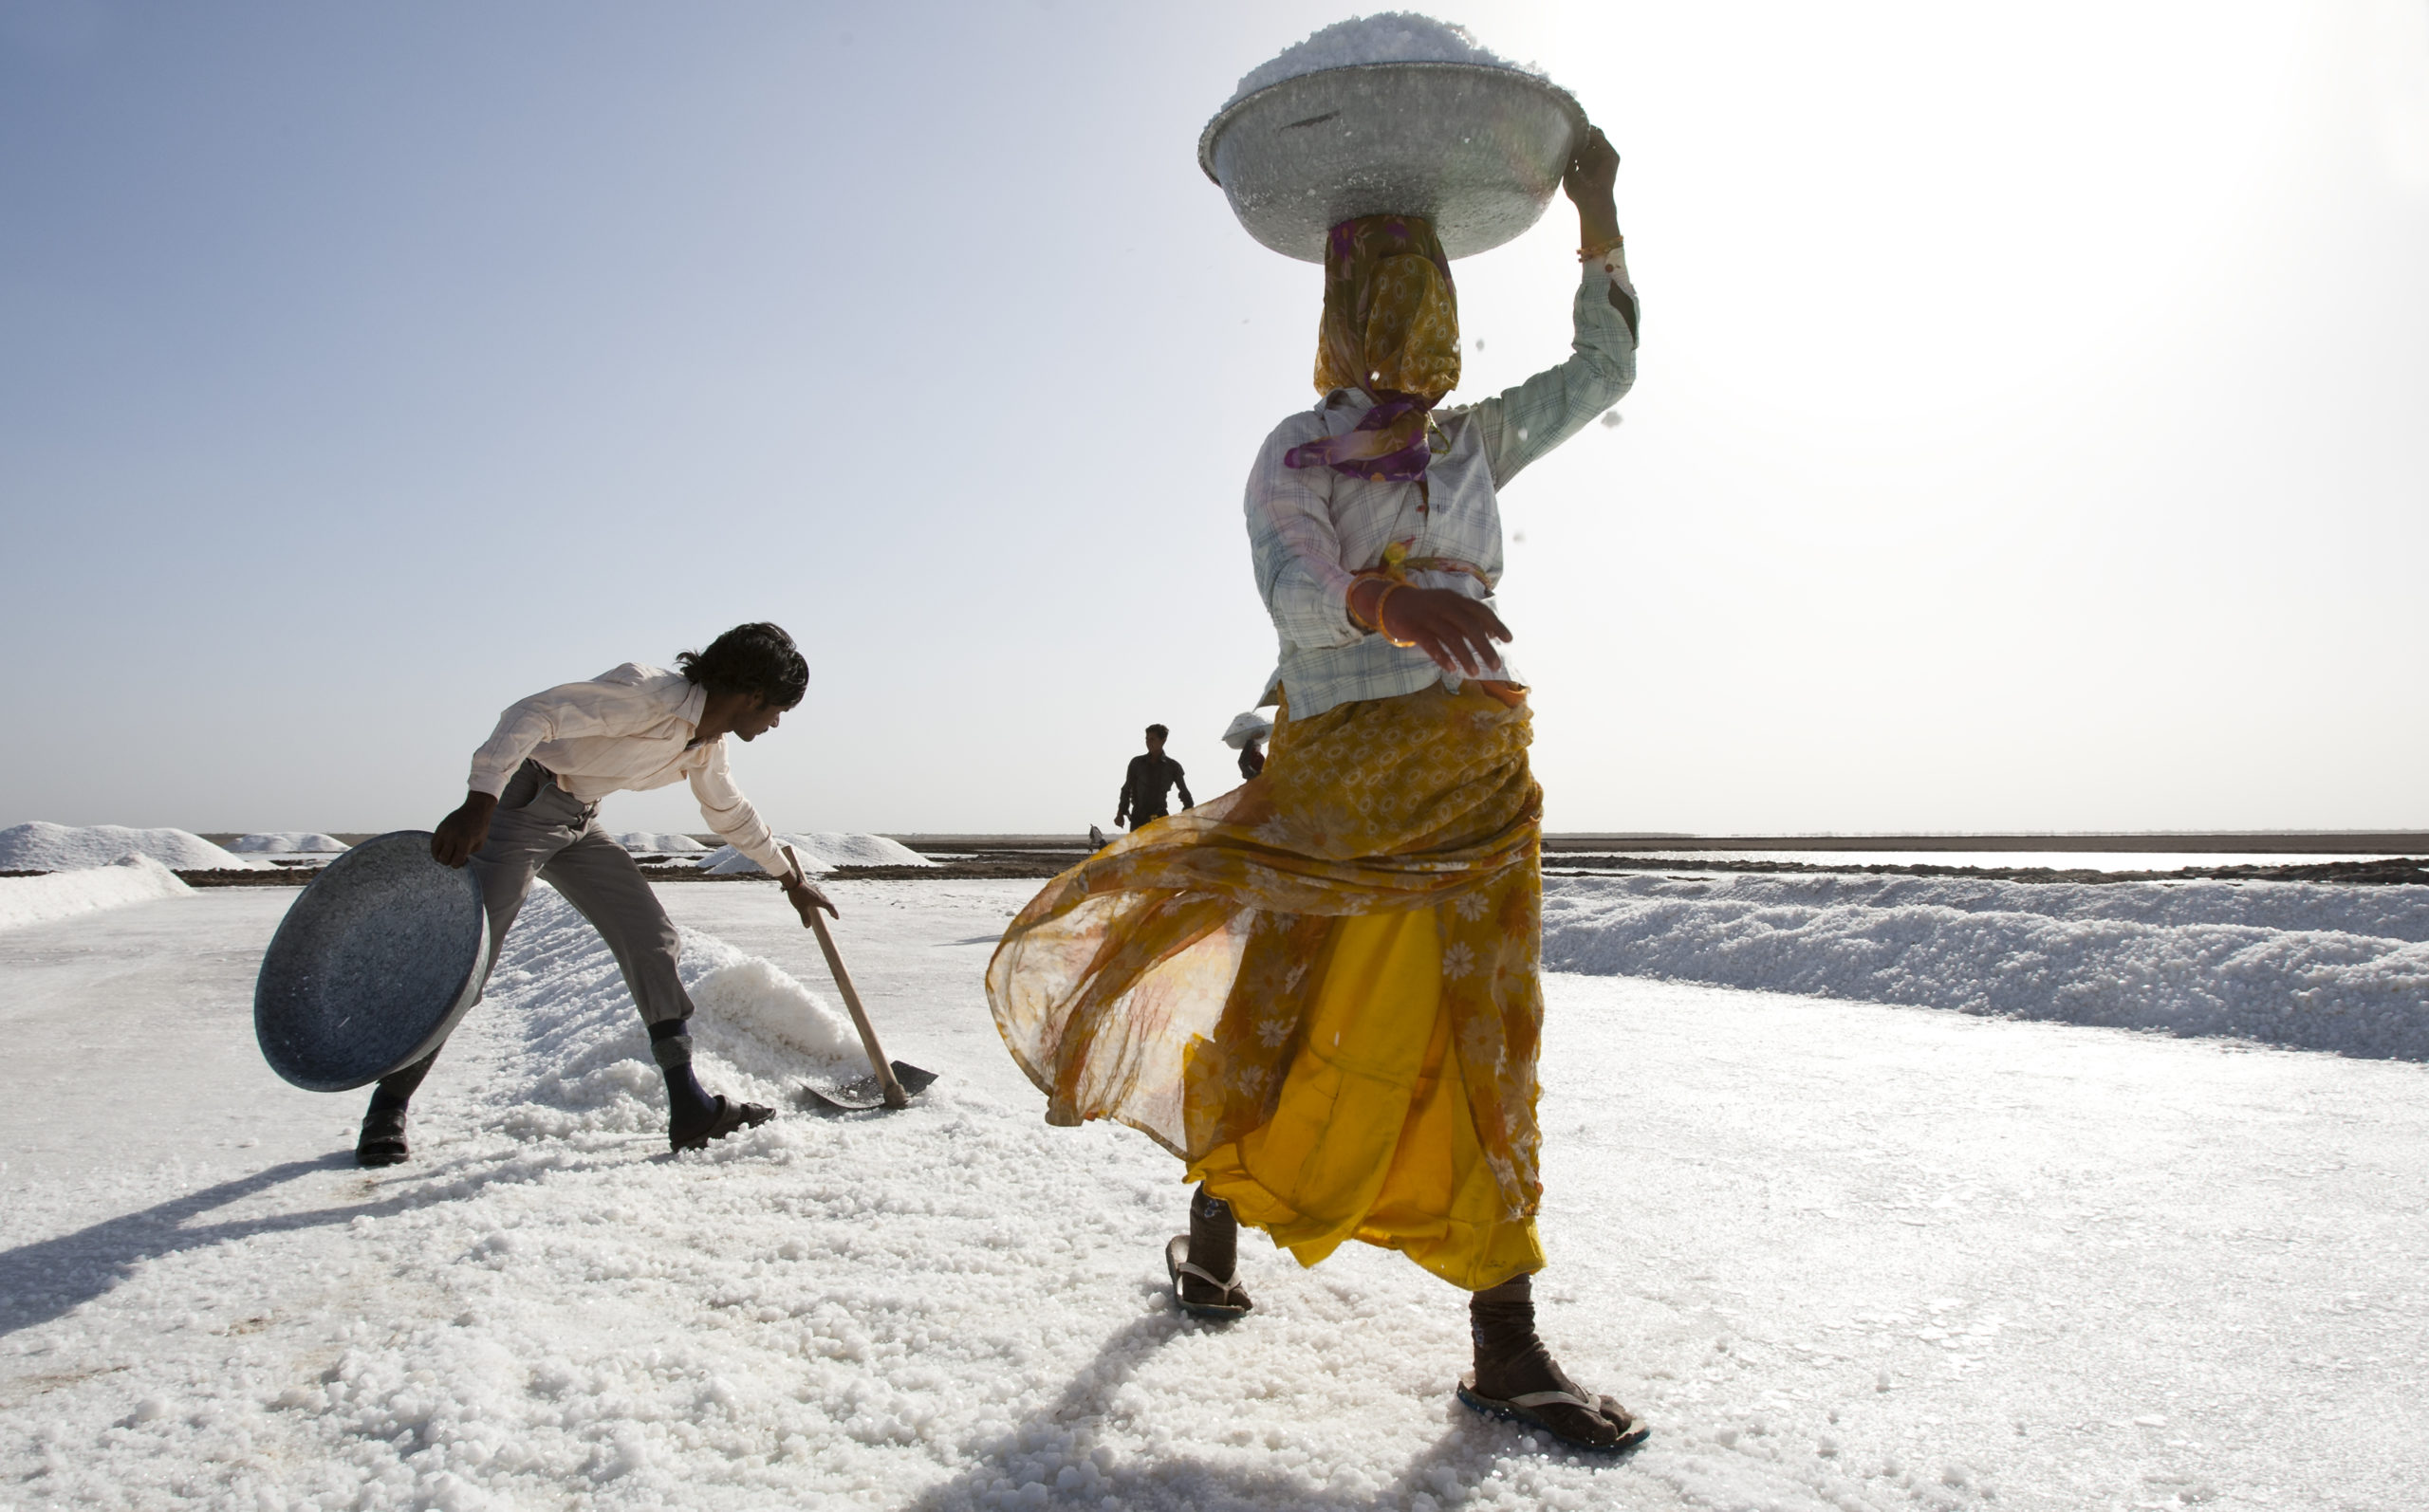 An Agariya woman transferring salt. Photo by Dhvanit Pandya/AHRM.